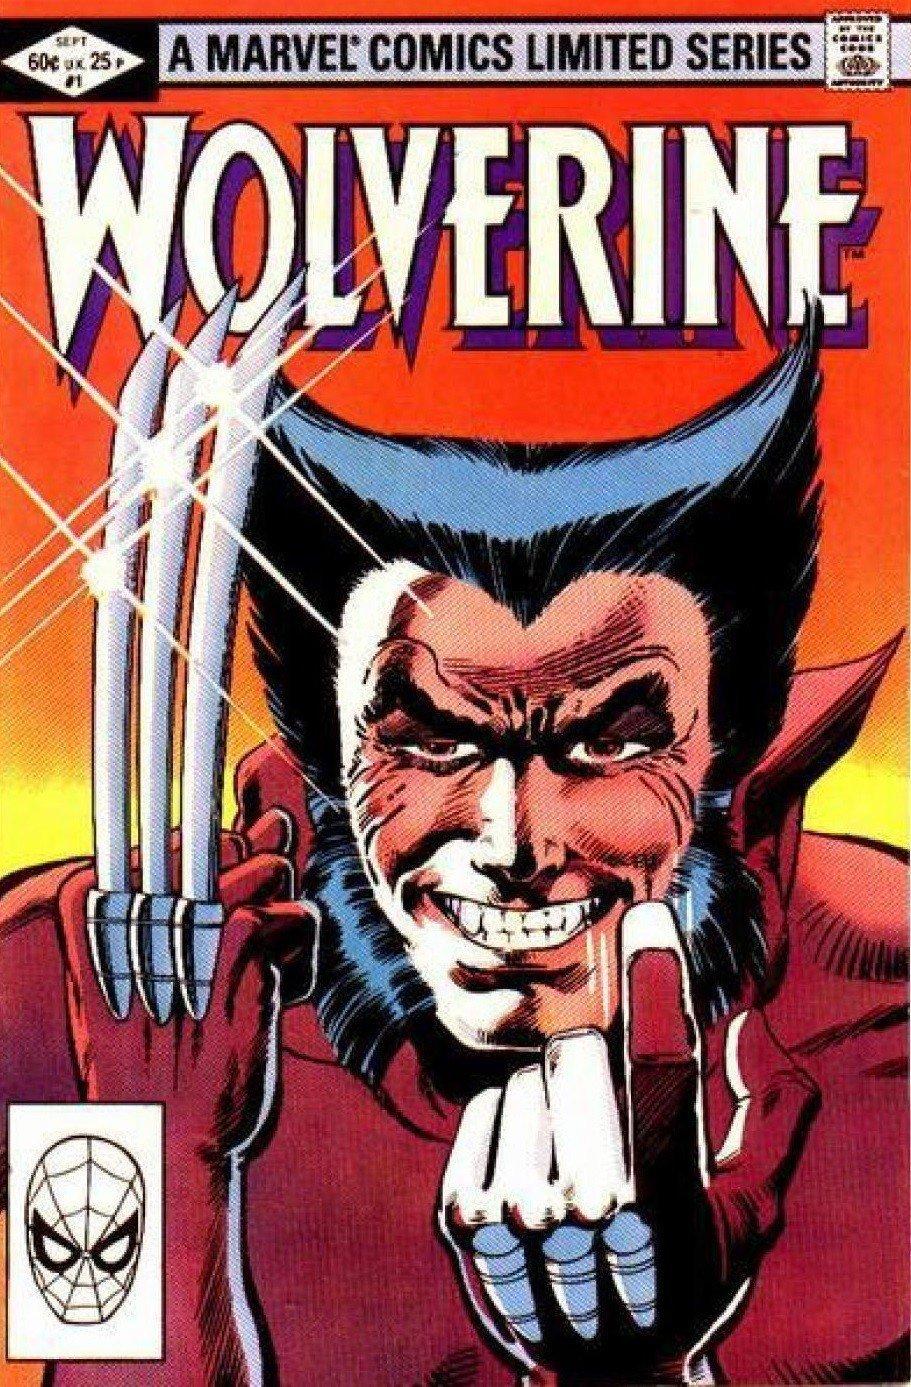 Wolverine Beard Comic : wolverine, beard, comic, Wolverine's, Hair???, Grand, Comic, Historians